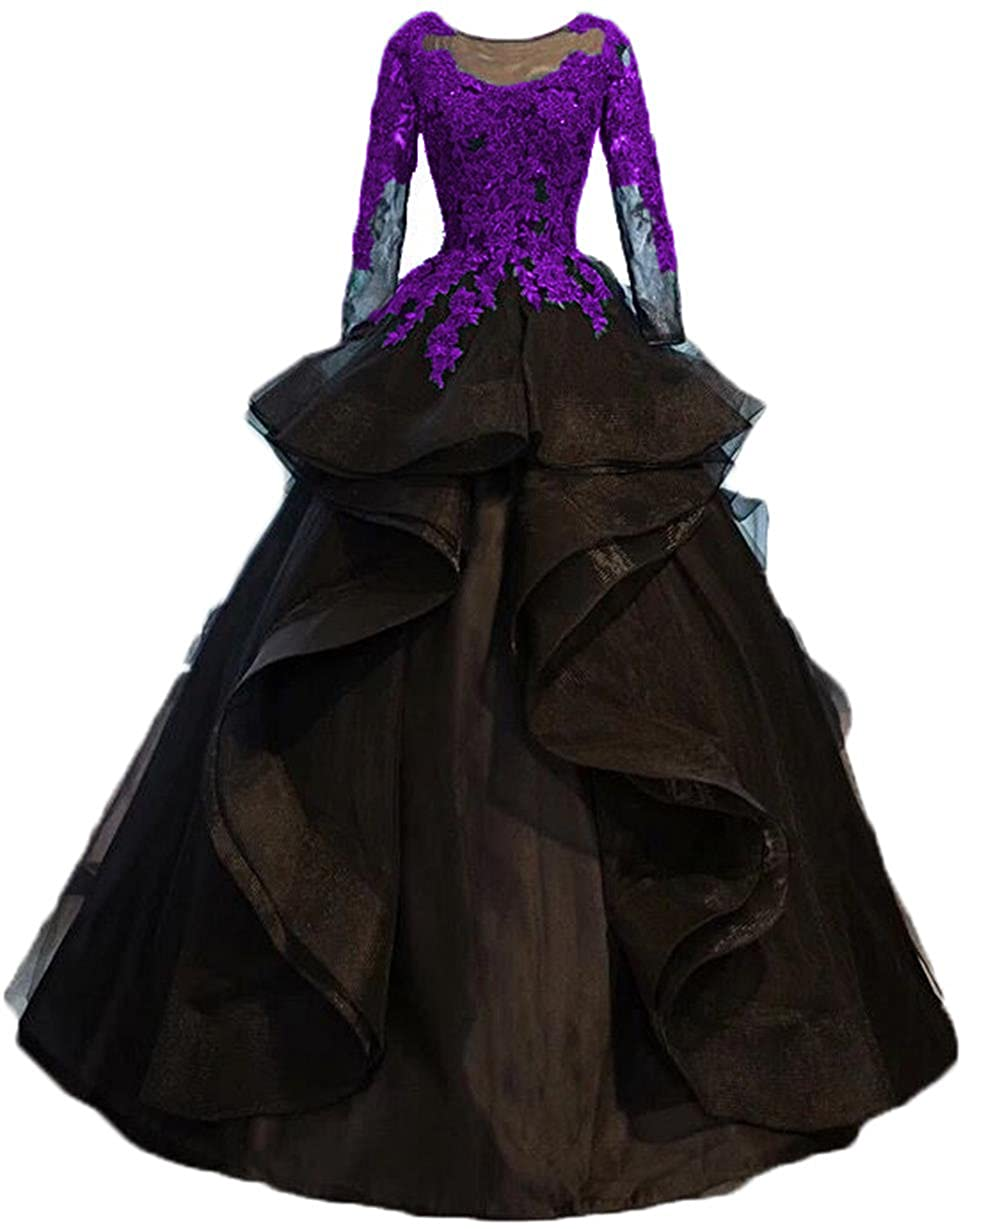 Purple Dydsz Evening Party Dresses for Women Wedding Long Sleeve Formal Dress Ball Gown D264